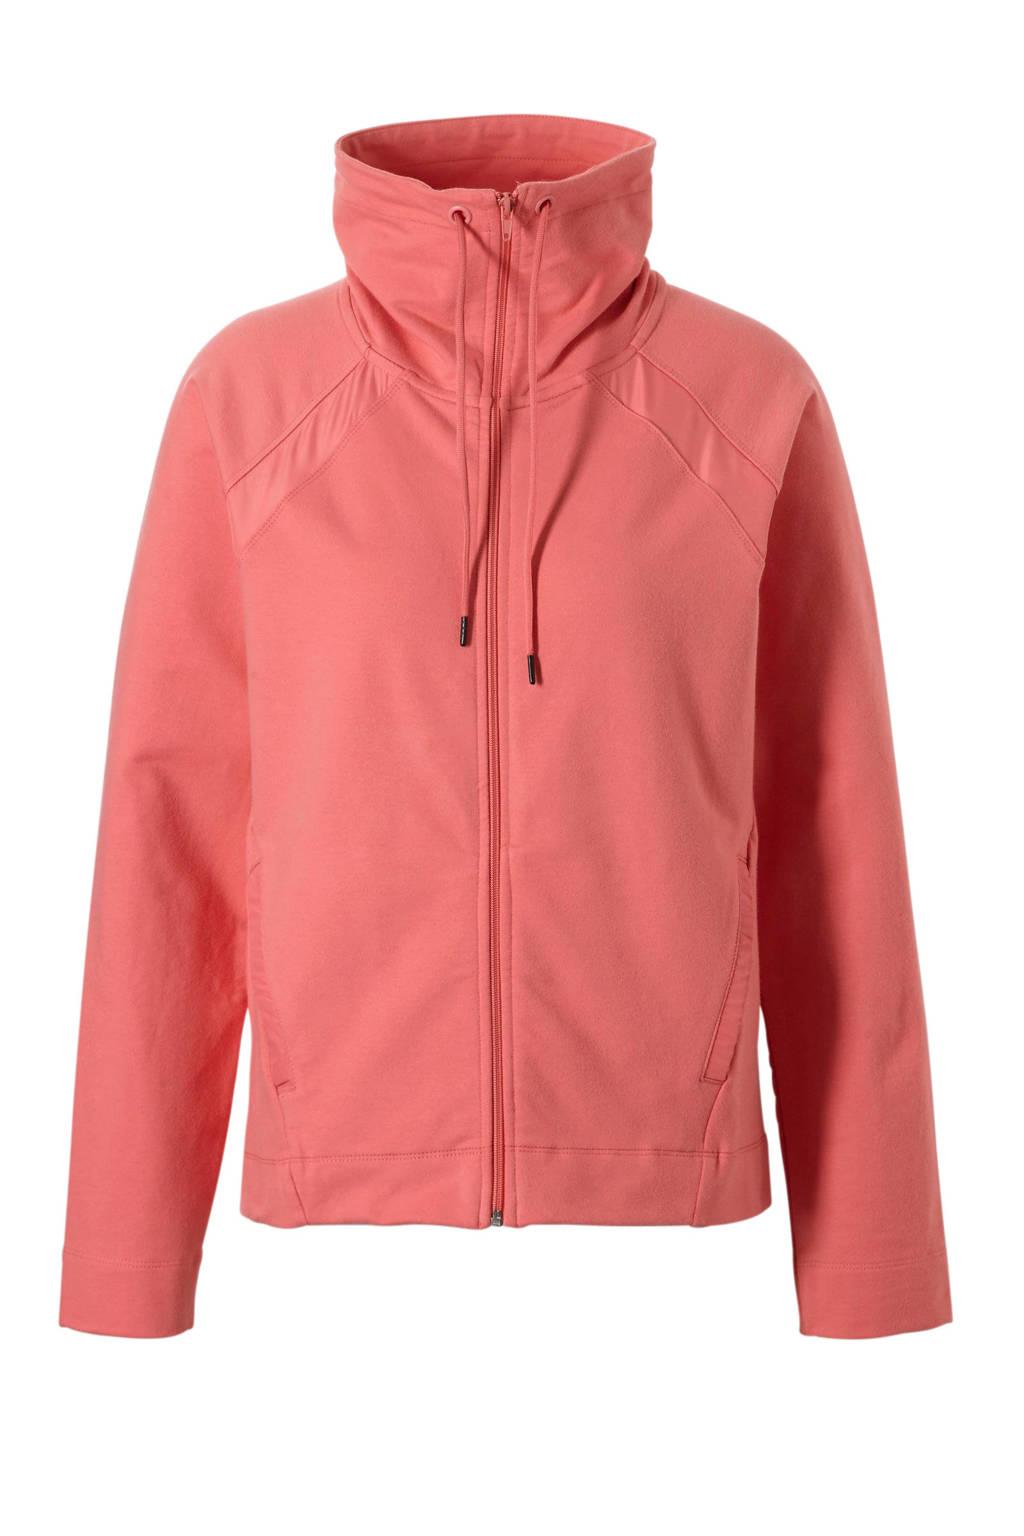 ESPRIT Women Sports sportvest roz, Roze